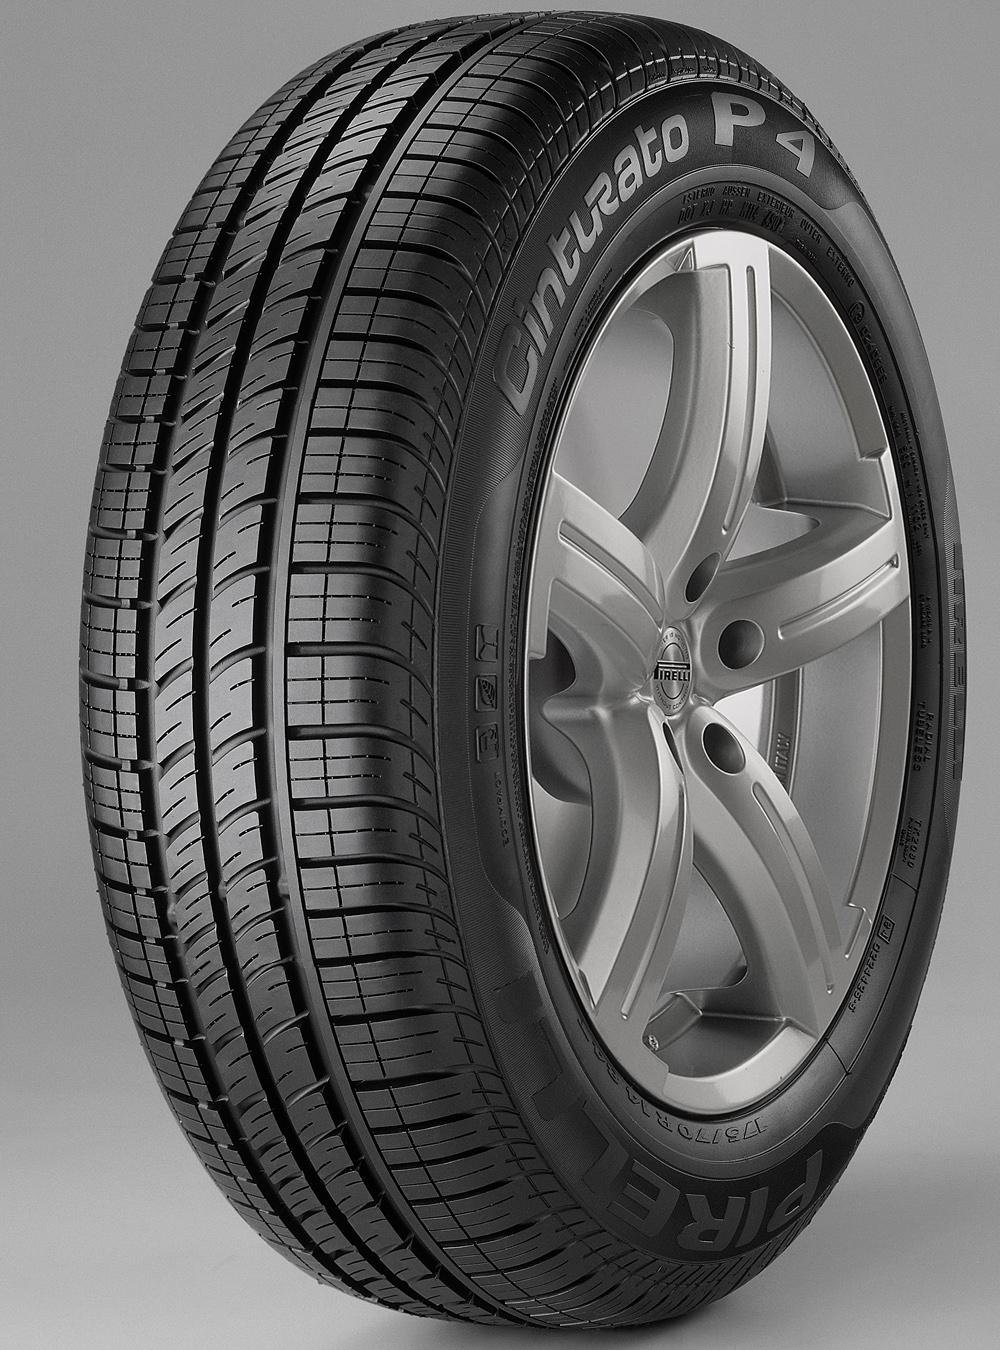 Asymetryczna opona Pirelli Cinturato P4